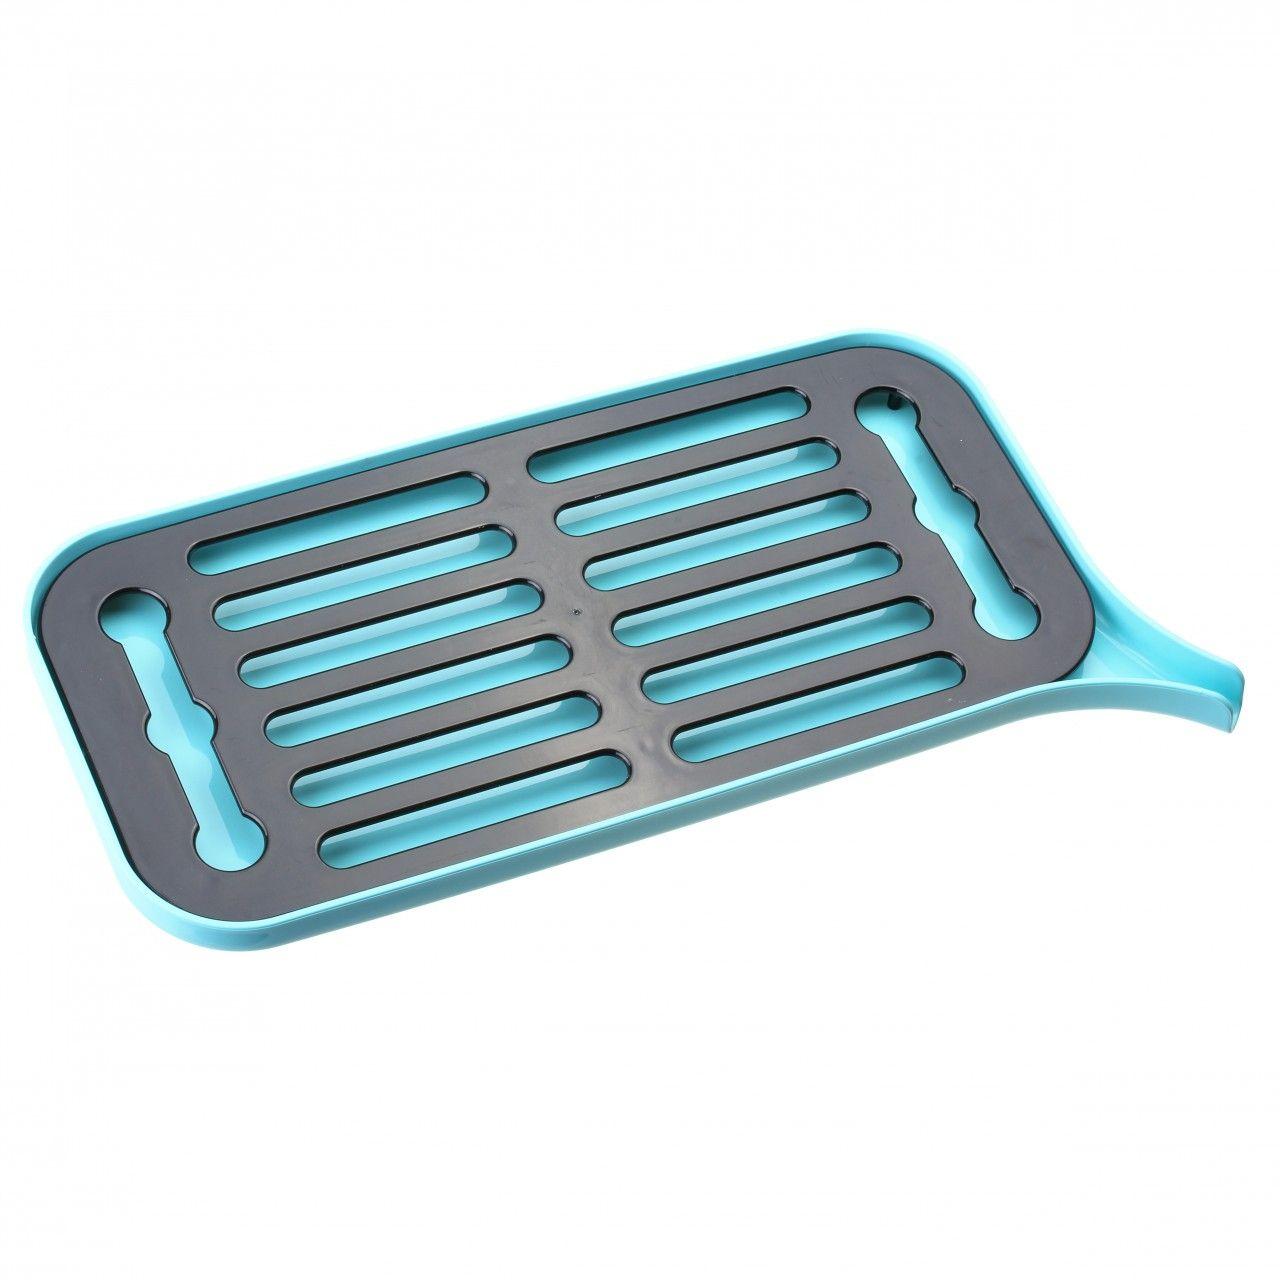 Сушилка для посуды ФлетиПодарки<br>Сушилка для посуды Флети<br>Размер: None; Объем: None; Материал: Пластик; Цвет: Голубой;